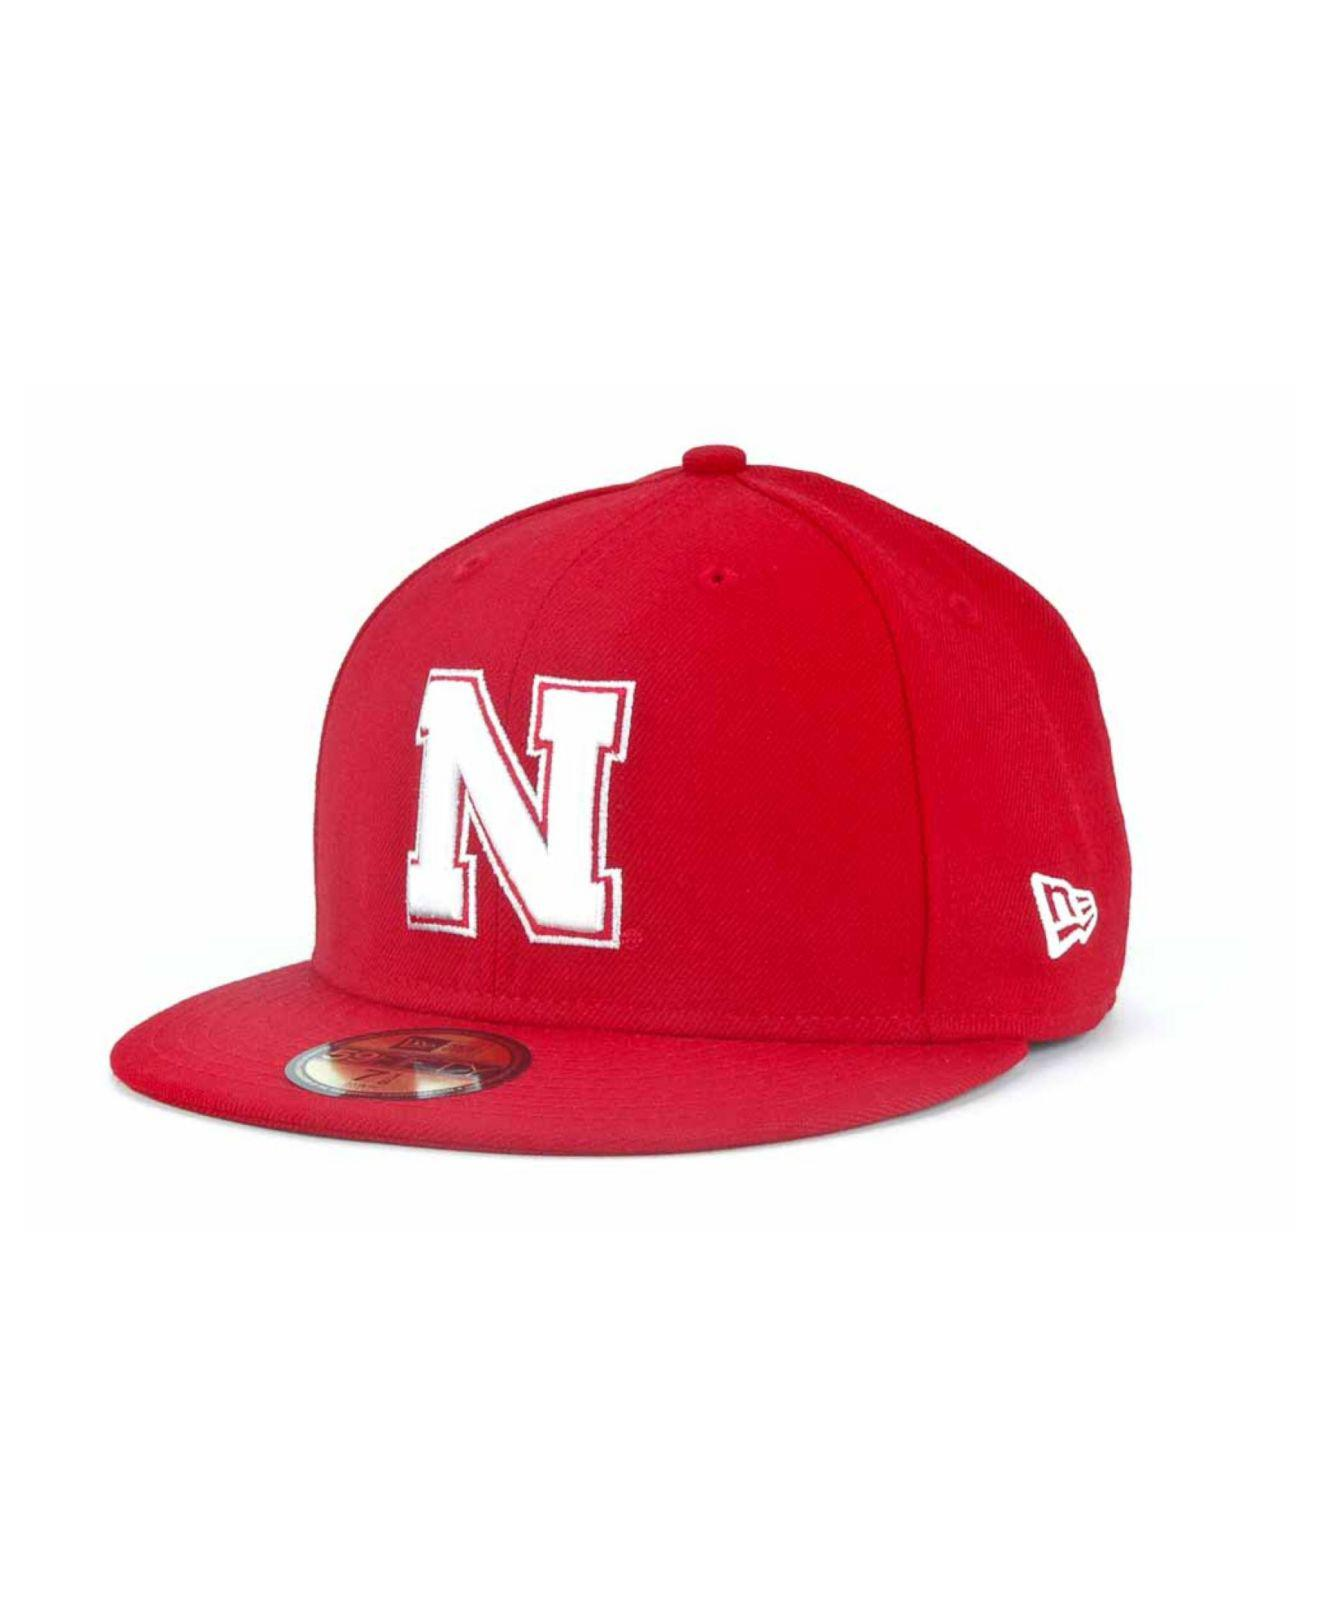 free shipping 44739 3872f KTZ. Men s Red Nebraska Cornhuskers 59fifty Cap